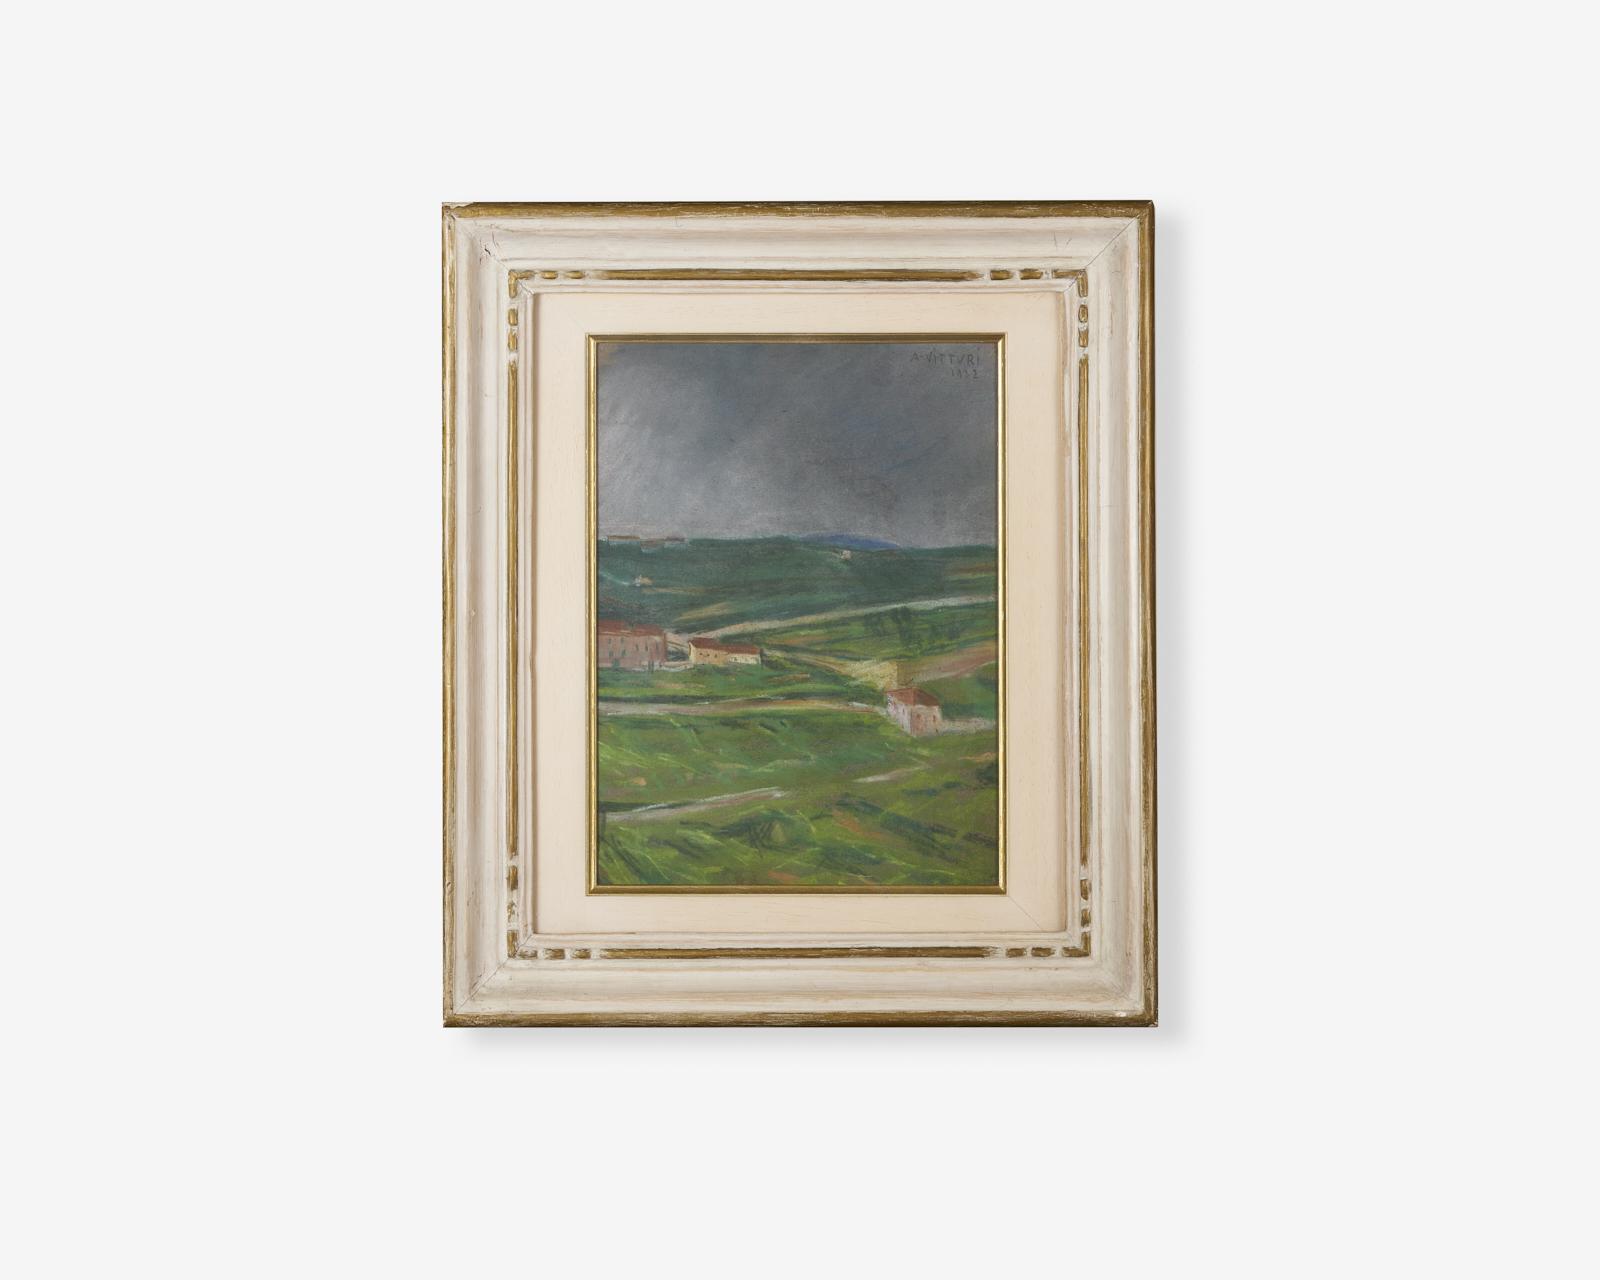 Albano-vitturi_le-torricelle_pastello-su-carta_1922_32x24